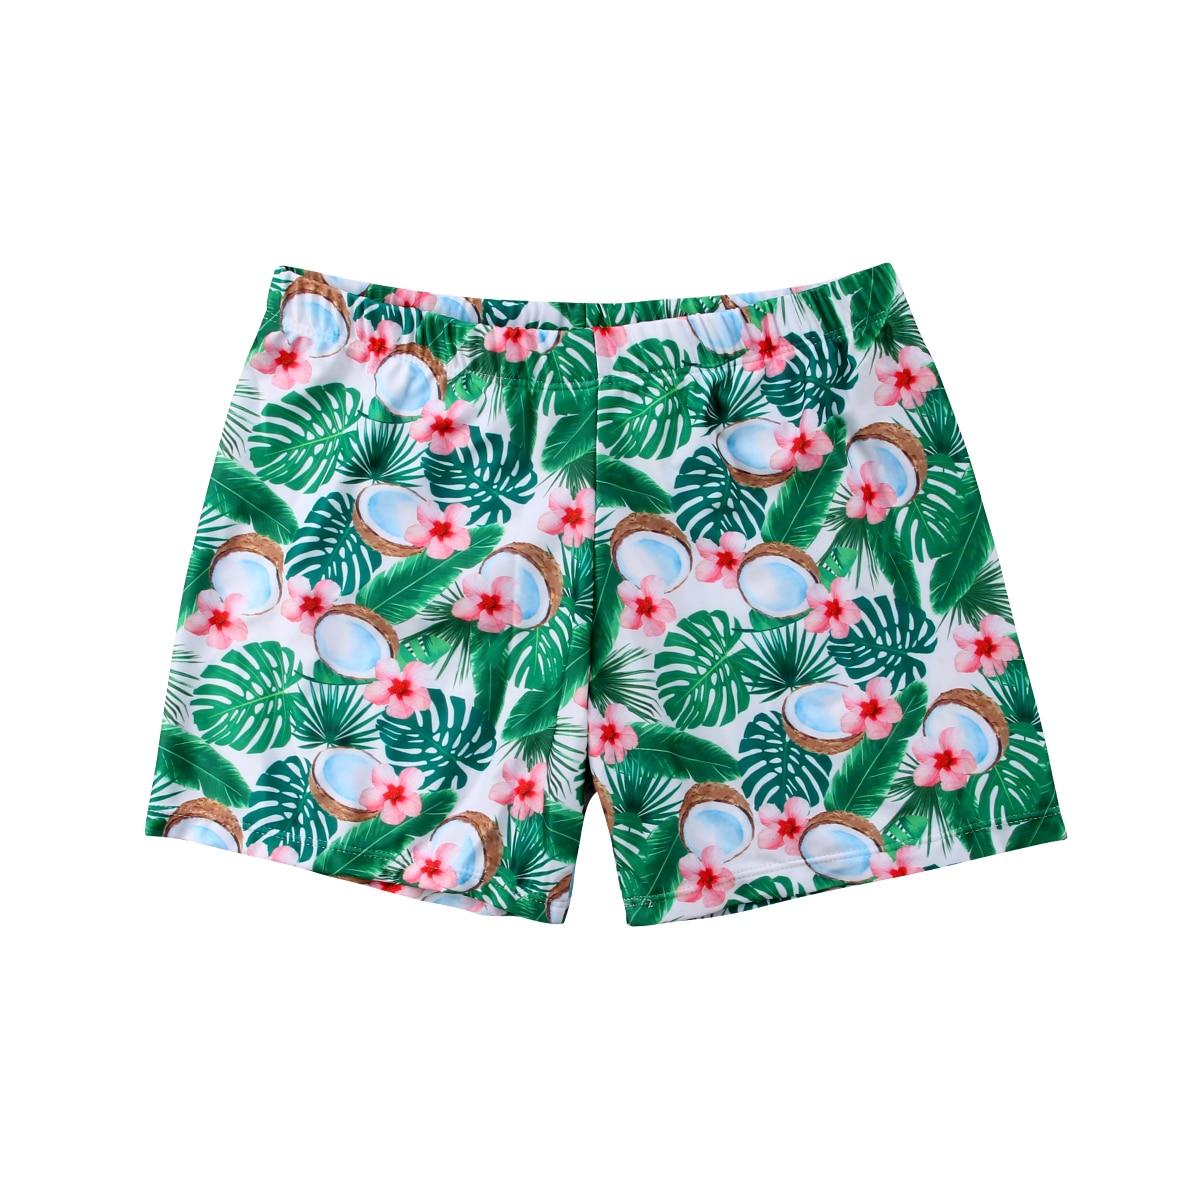 Men's Casual   Shorts   Sexy Board   Shorts   Beach Wear Swimsuit Beach   Short   Pants Underwear Summer Holiday